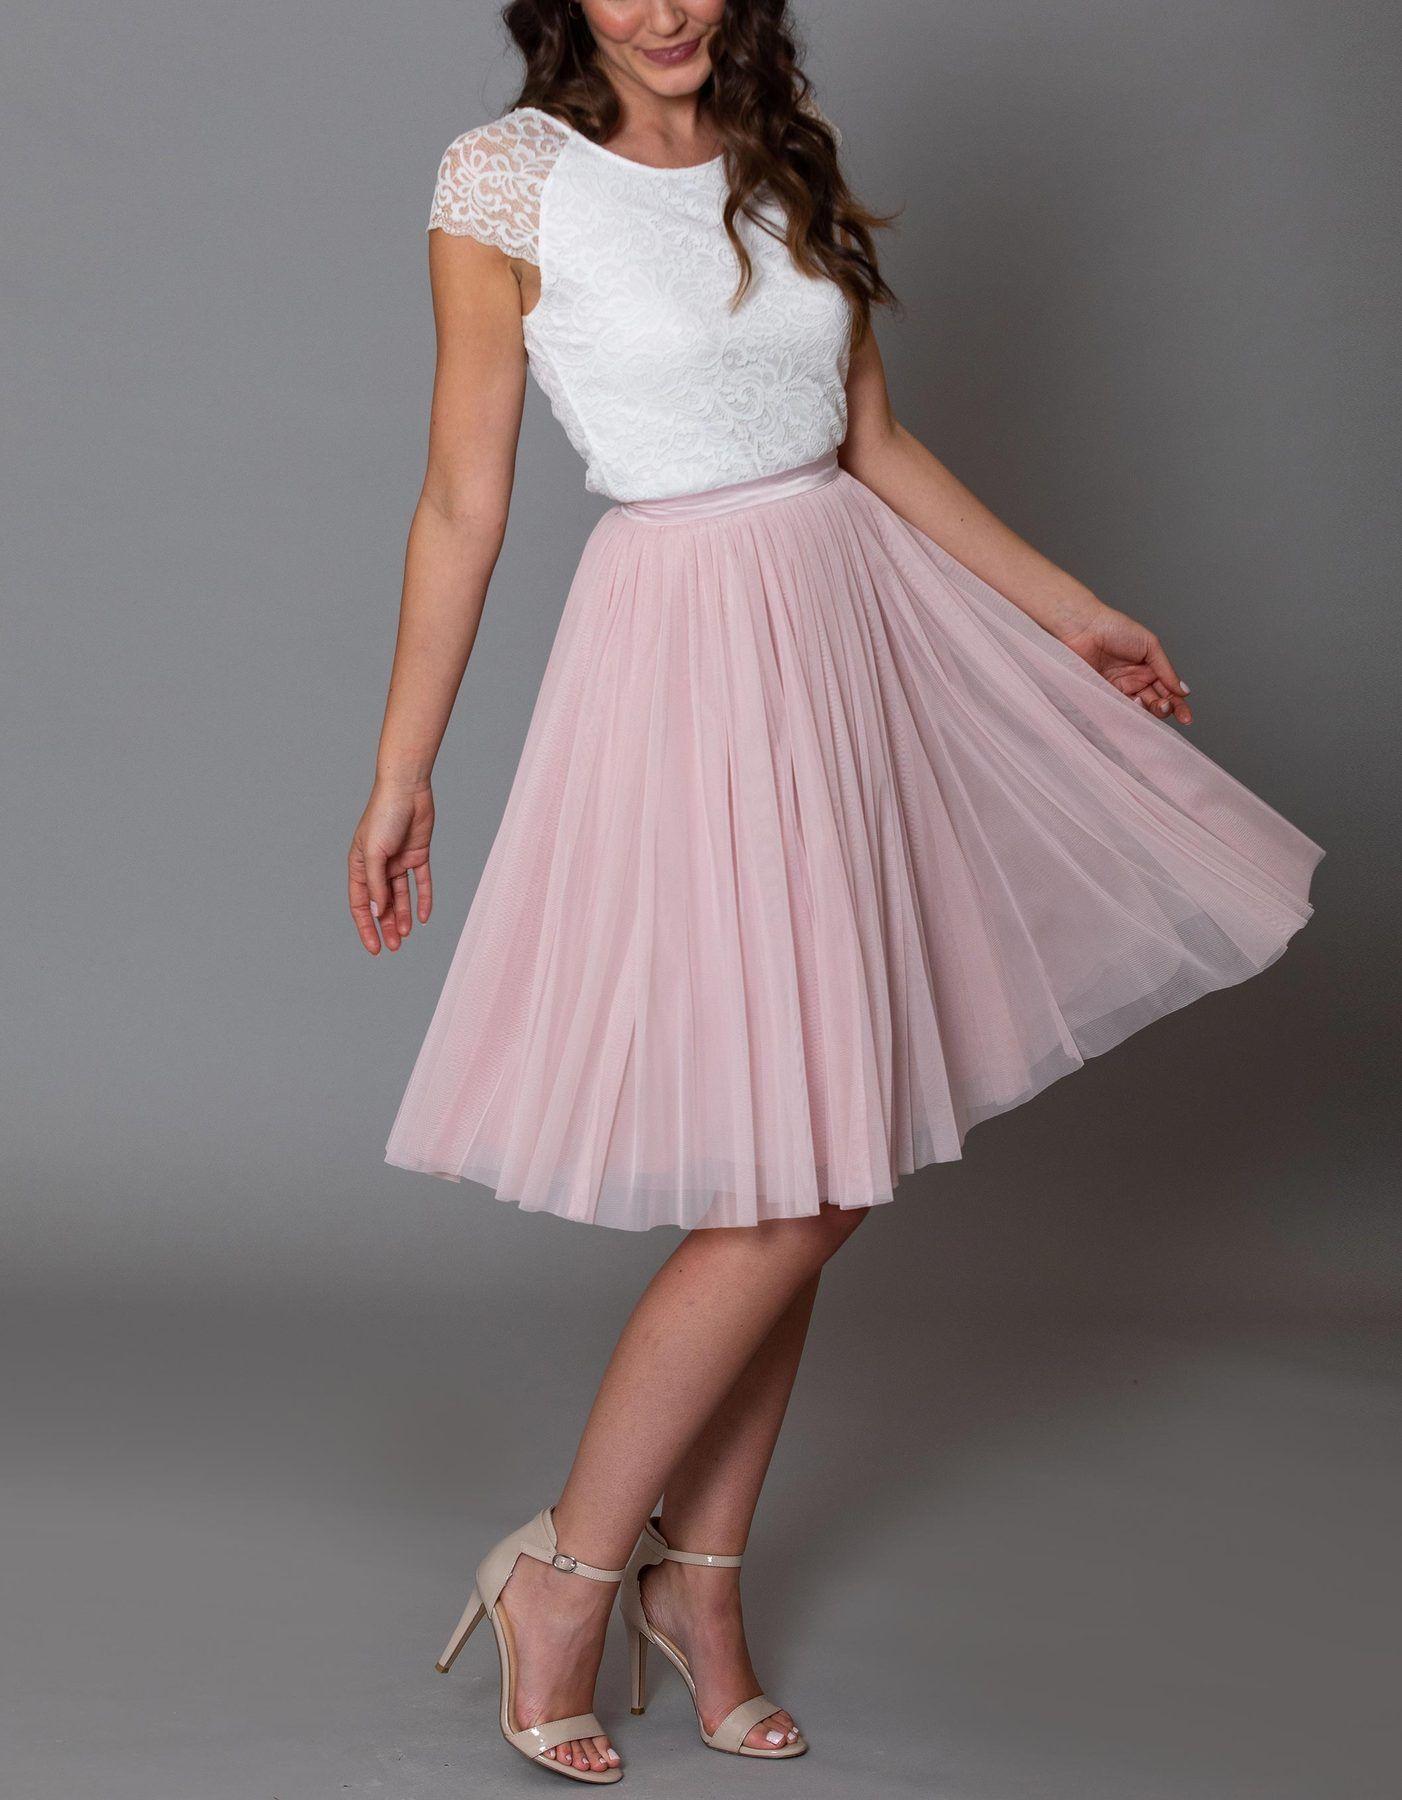 CONSTANT LOVE Tüll Rock kurz Soft-Rose | Kleid standesamt ...